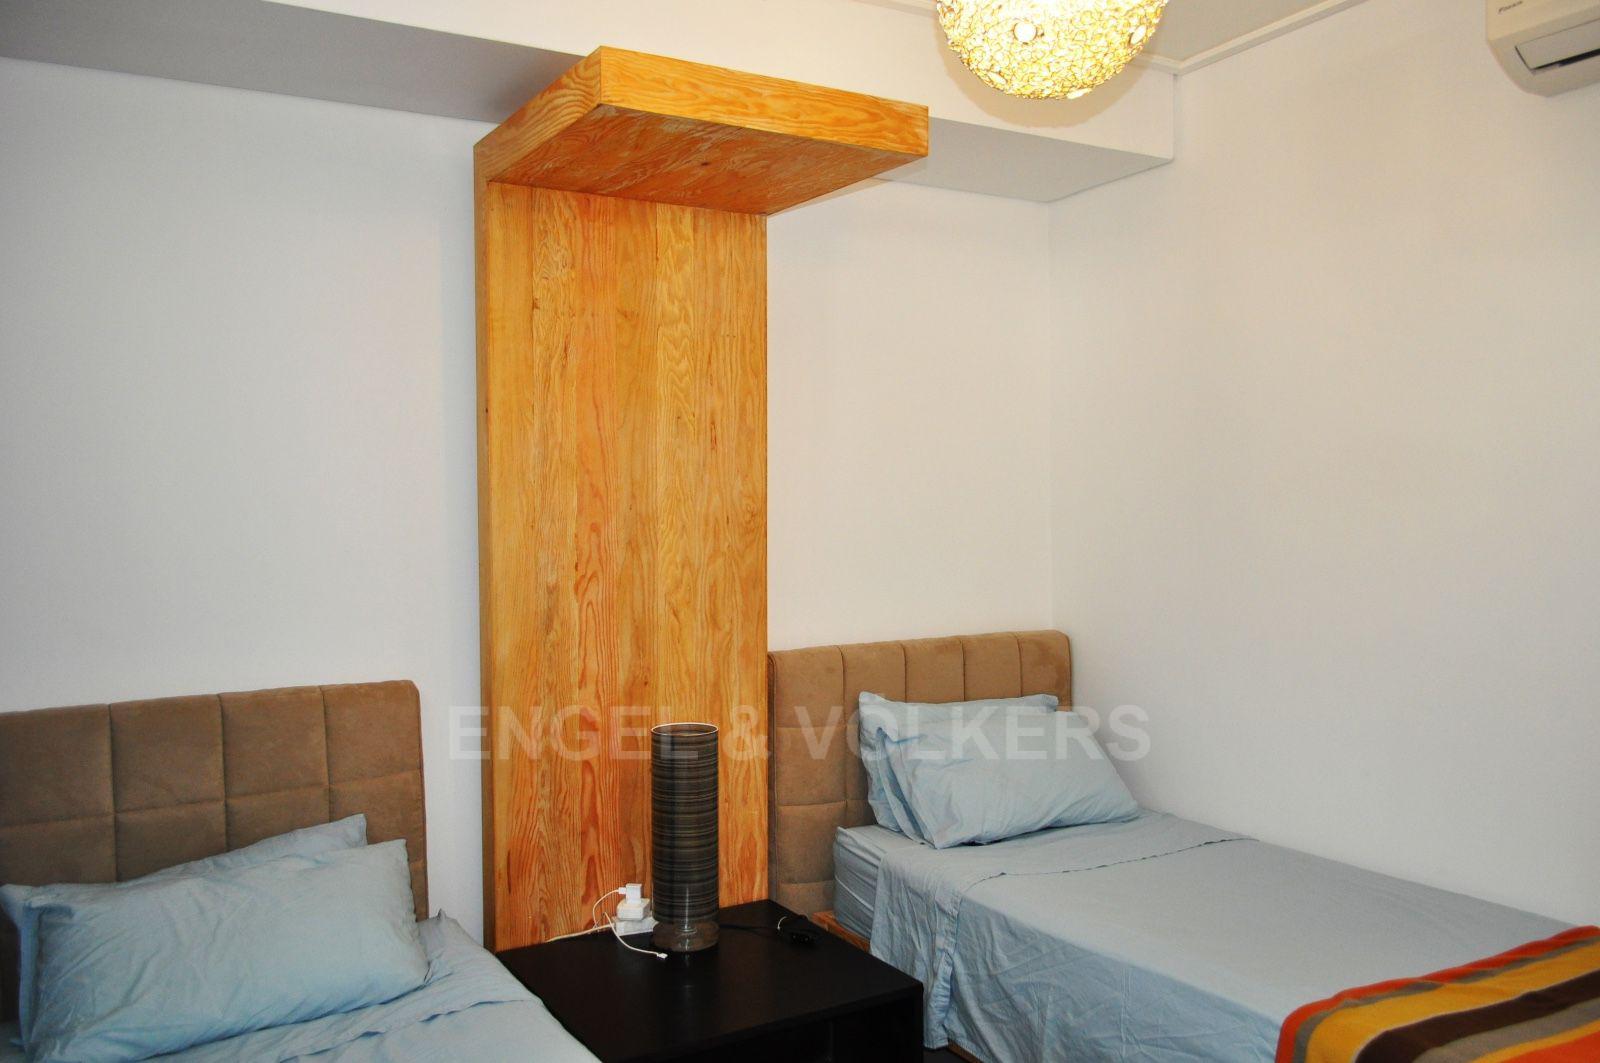 De Waterkant property for sale. Ref No: 13450081. Picture no 12